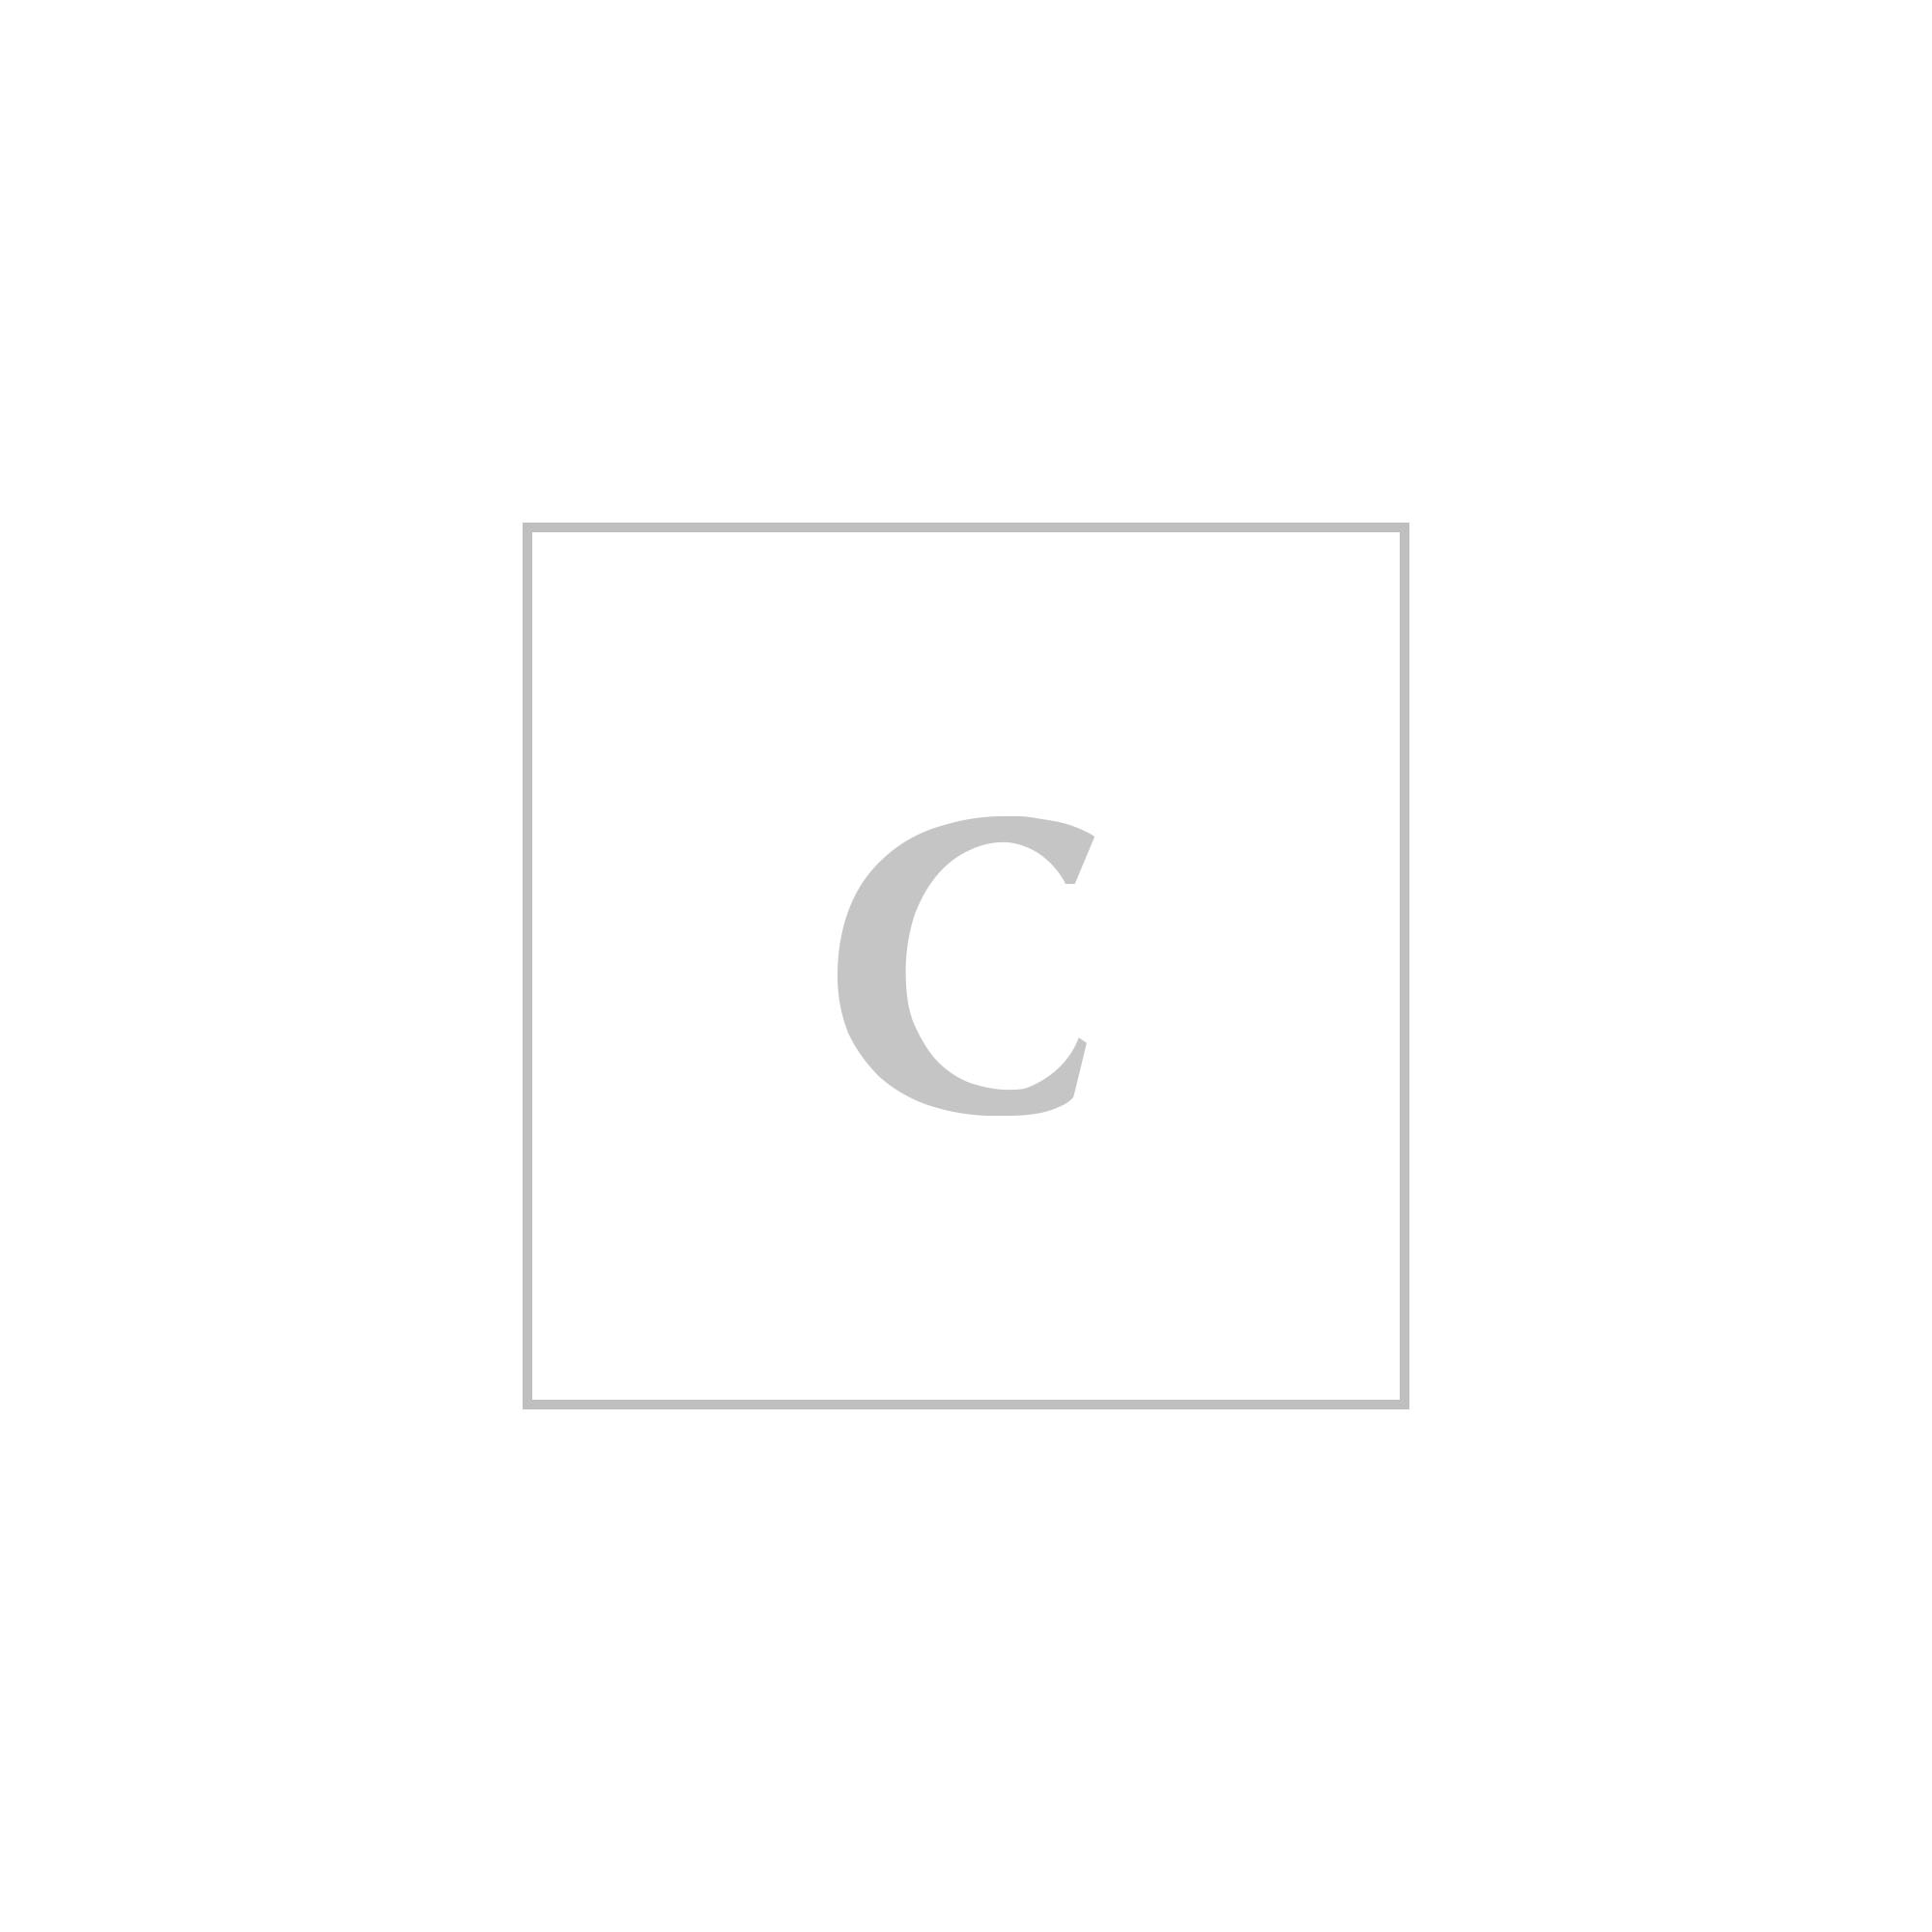 Dolce & gabbana sciarpa gerry 120x200+ frange